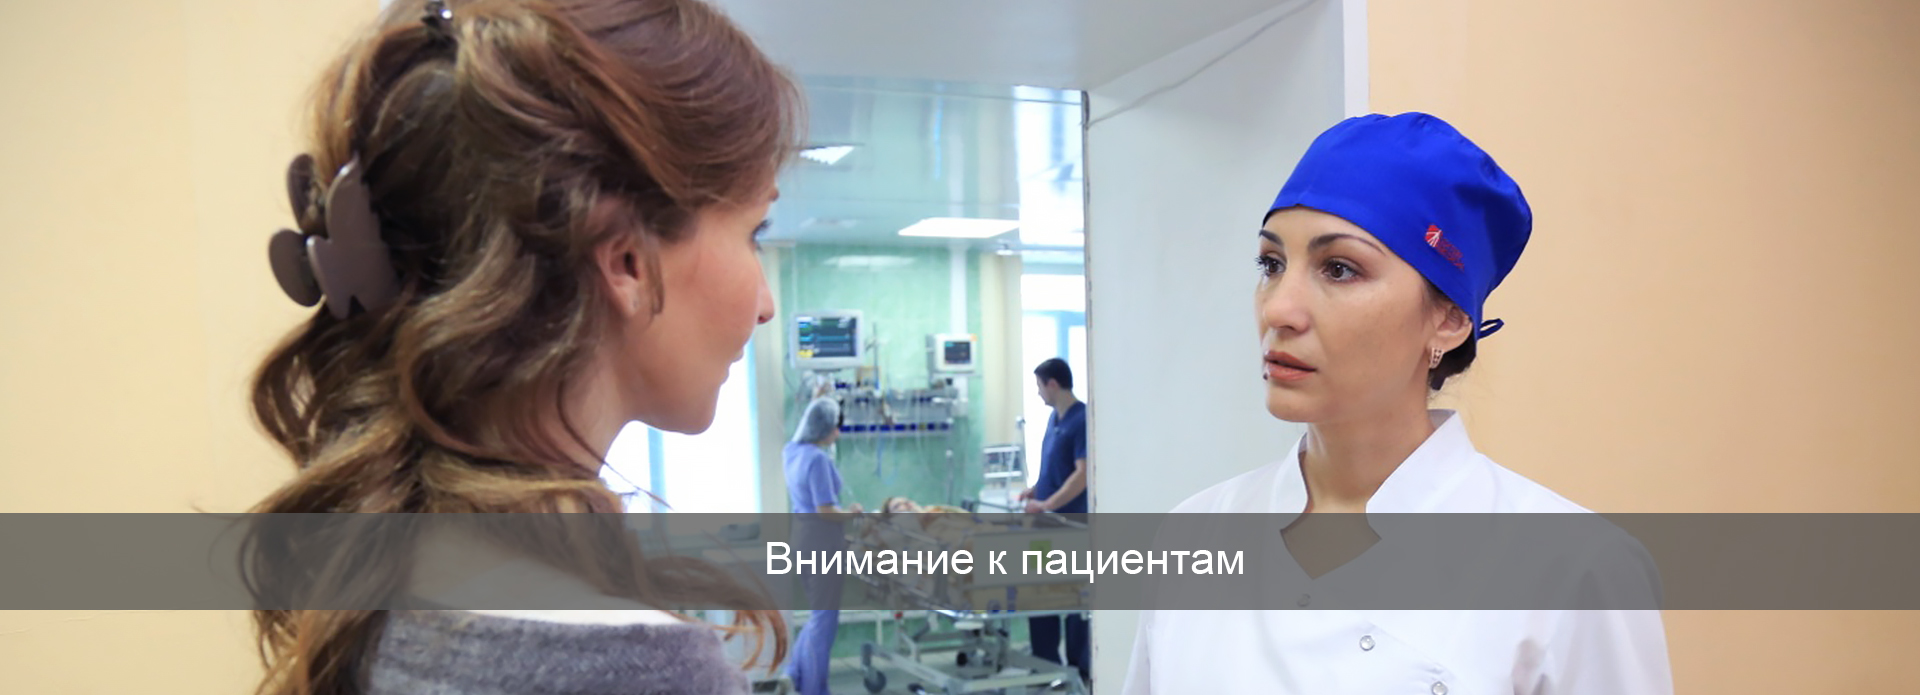 Внимание к пациентам